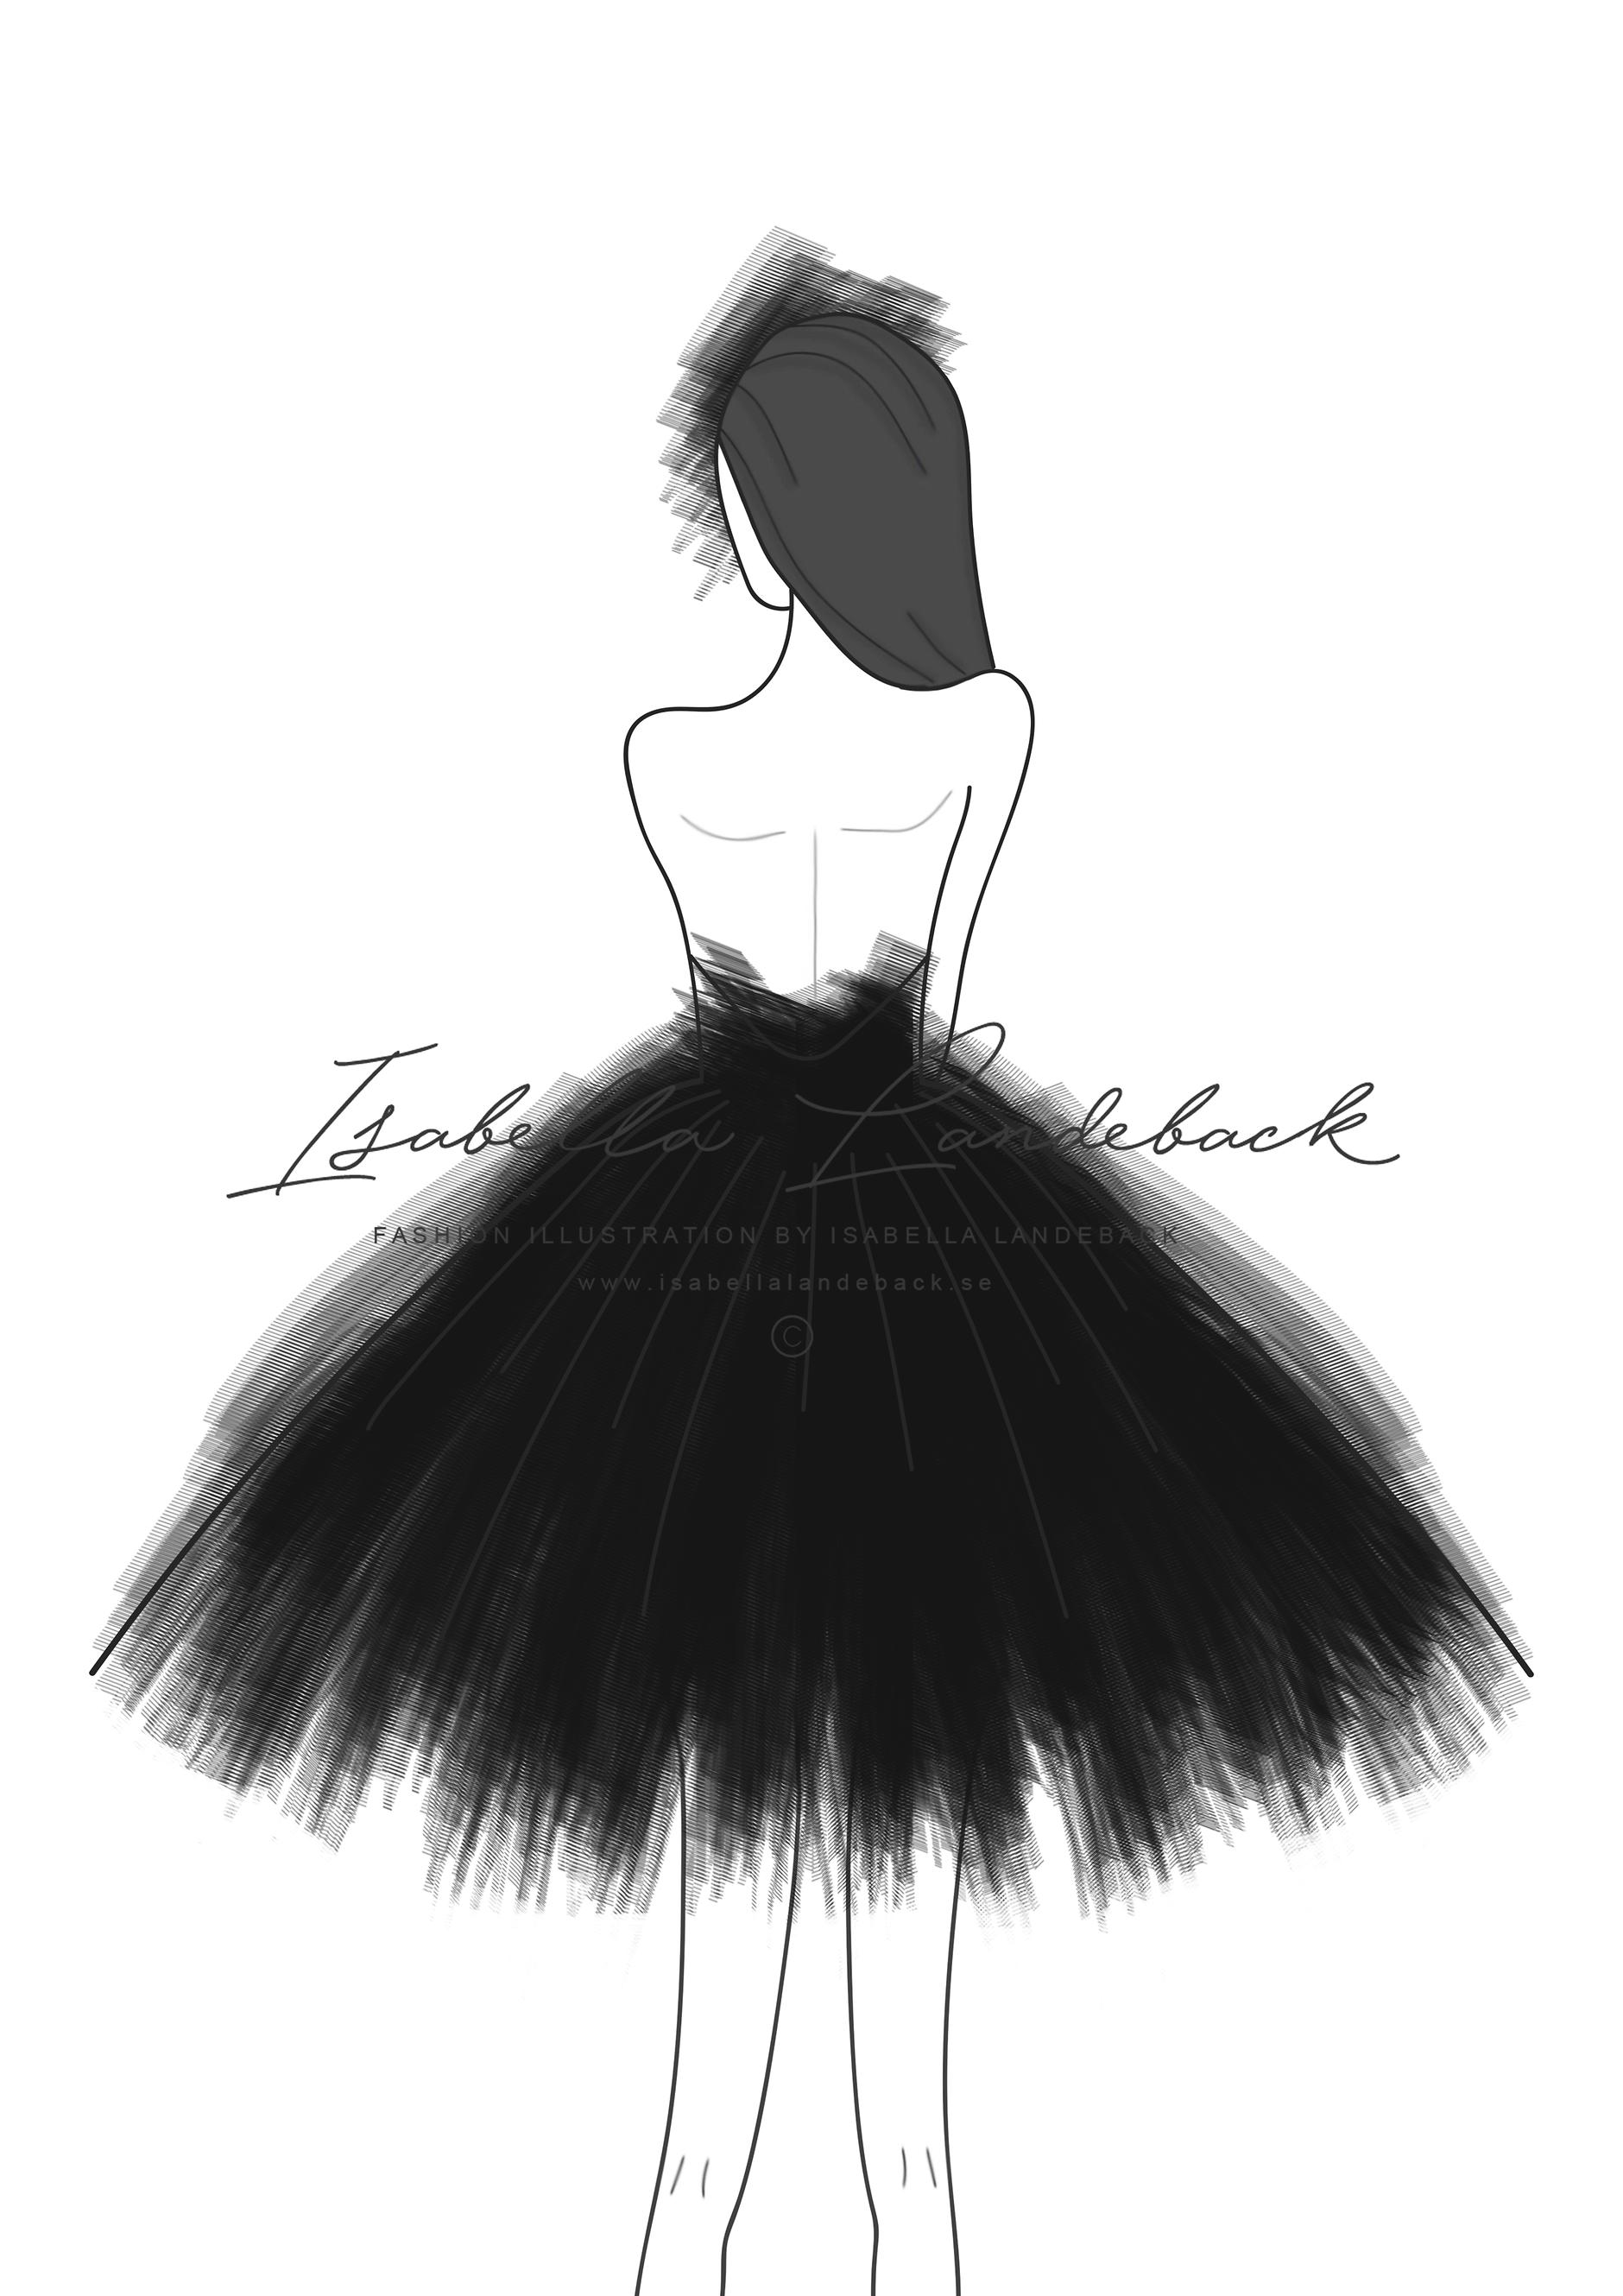 Tulle dress illustration